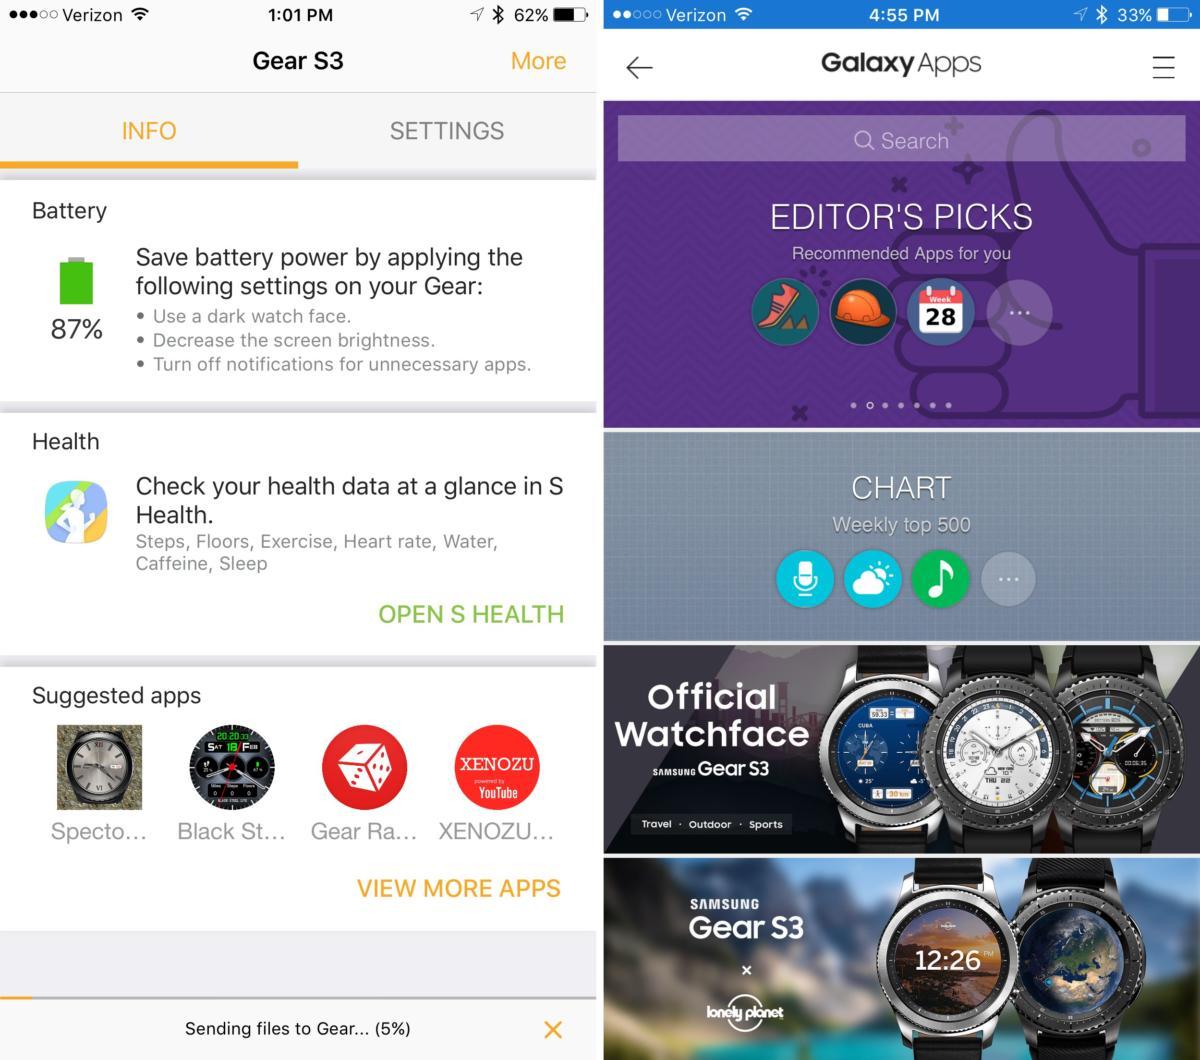 gears3 iphone app